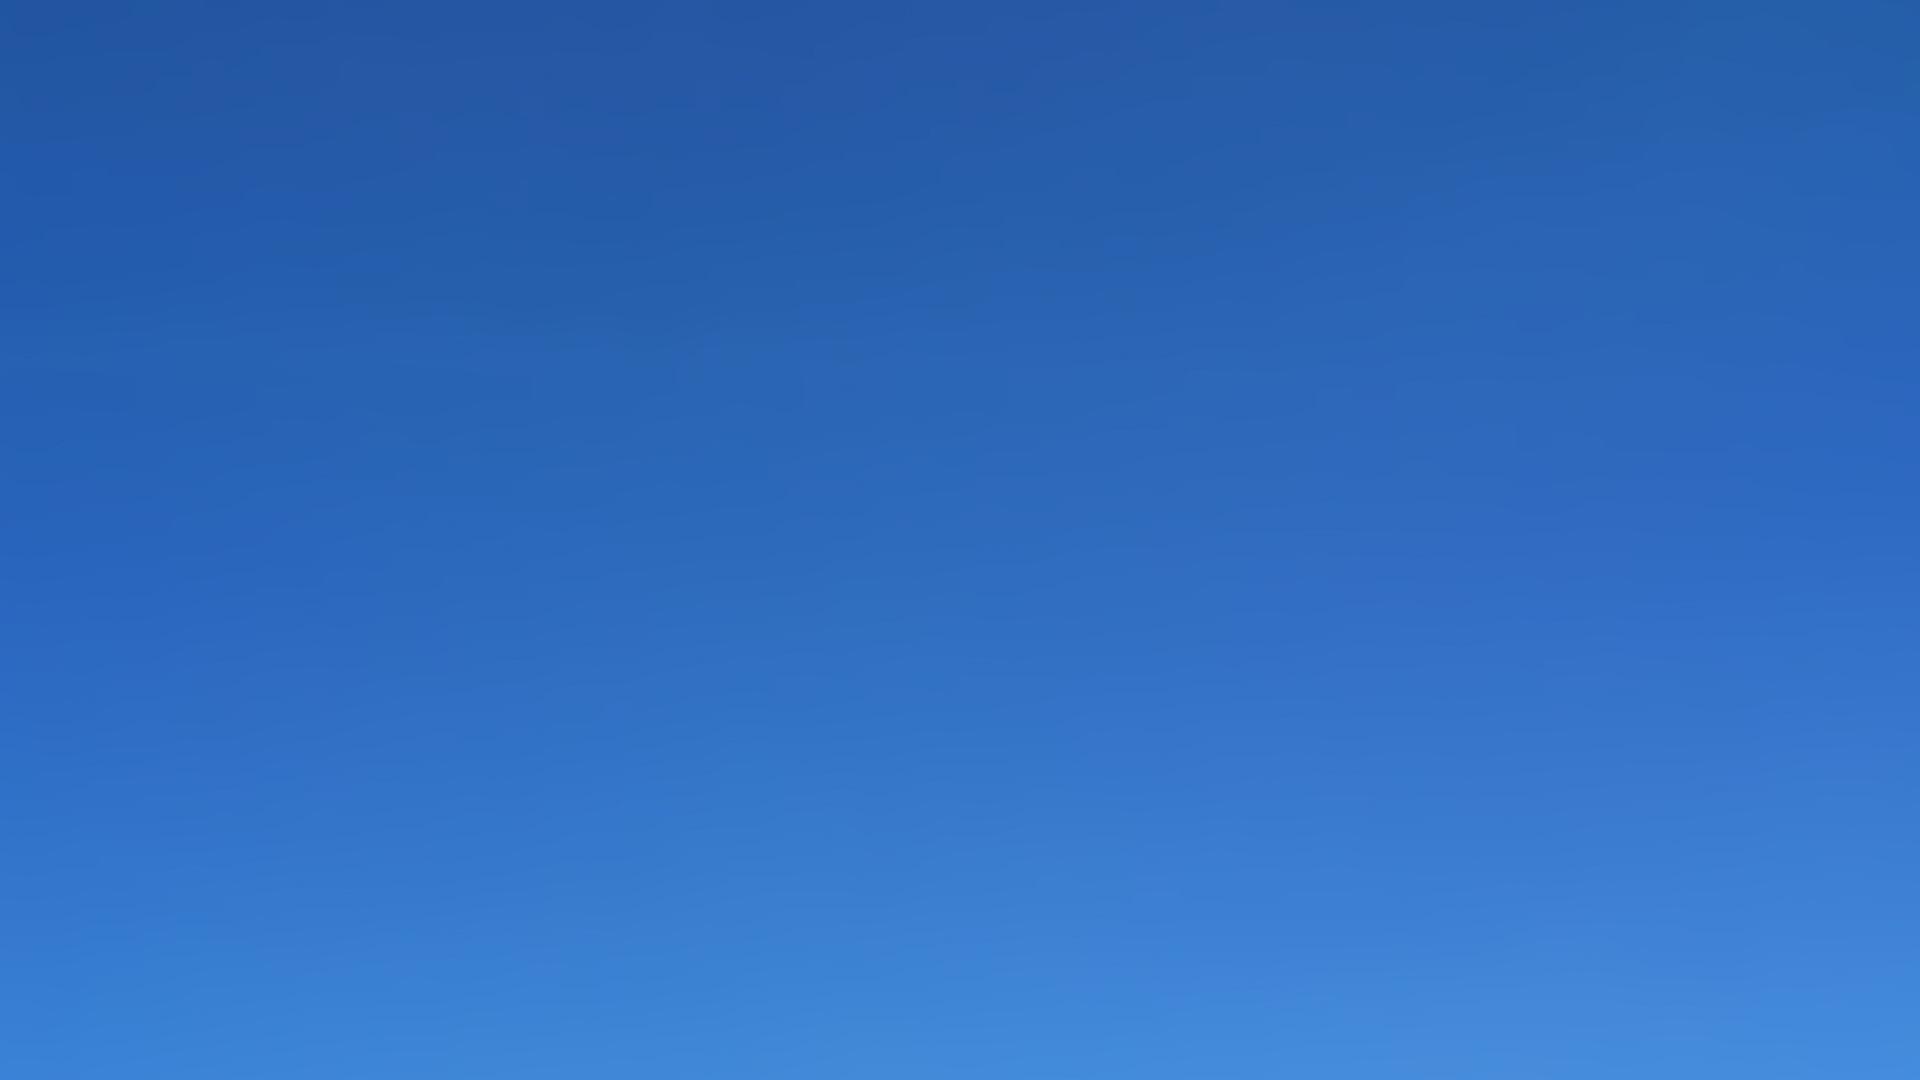 Blue sky desktop wallpapers ojdo 1920x1080